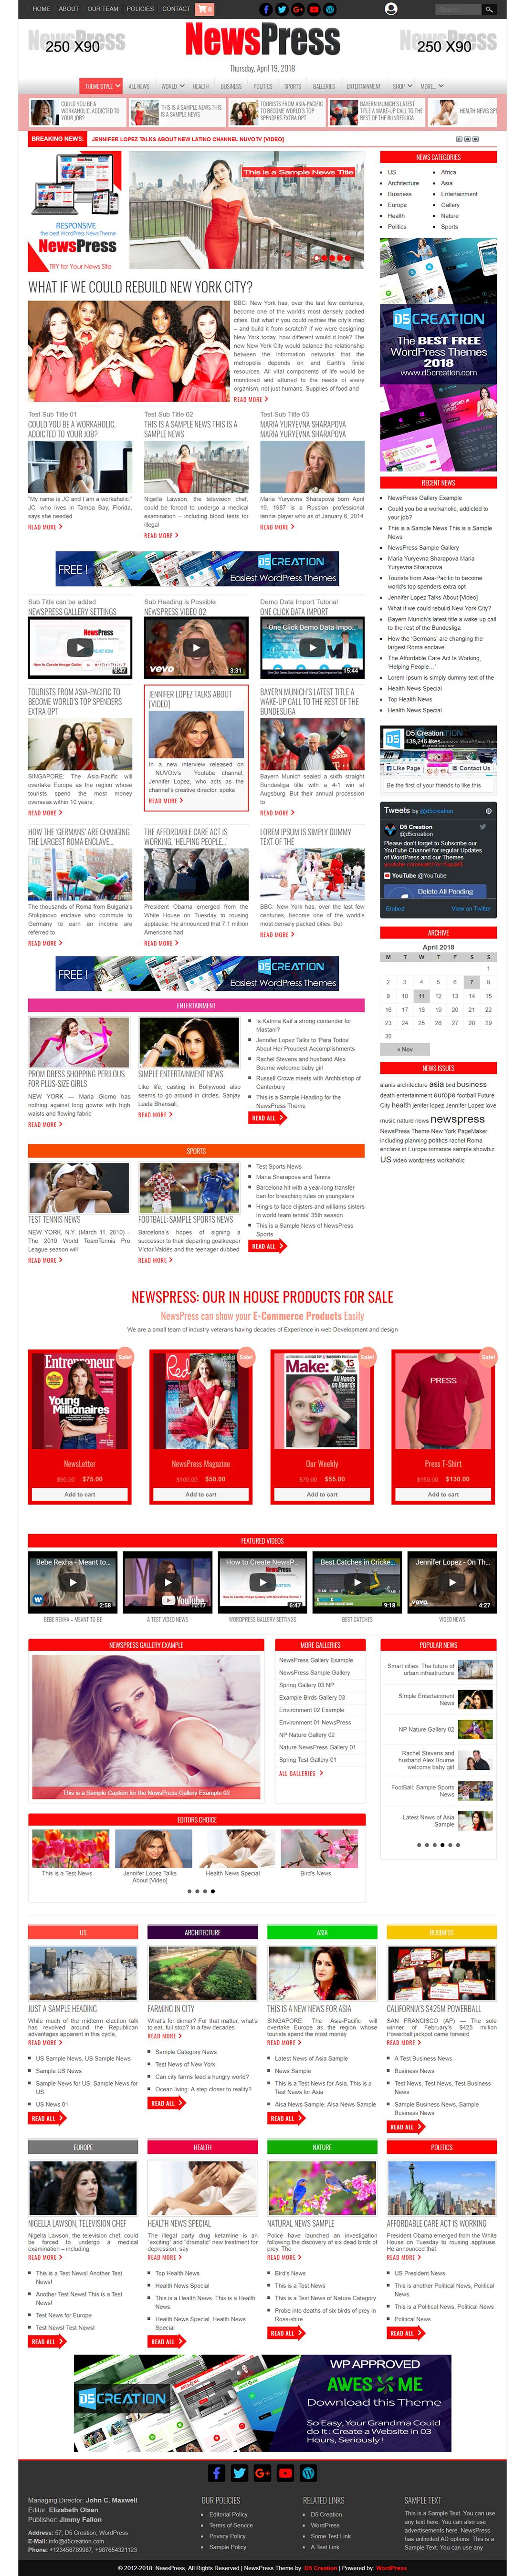 NewsPress, WordPress News Theme